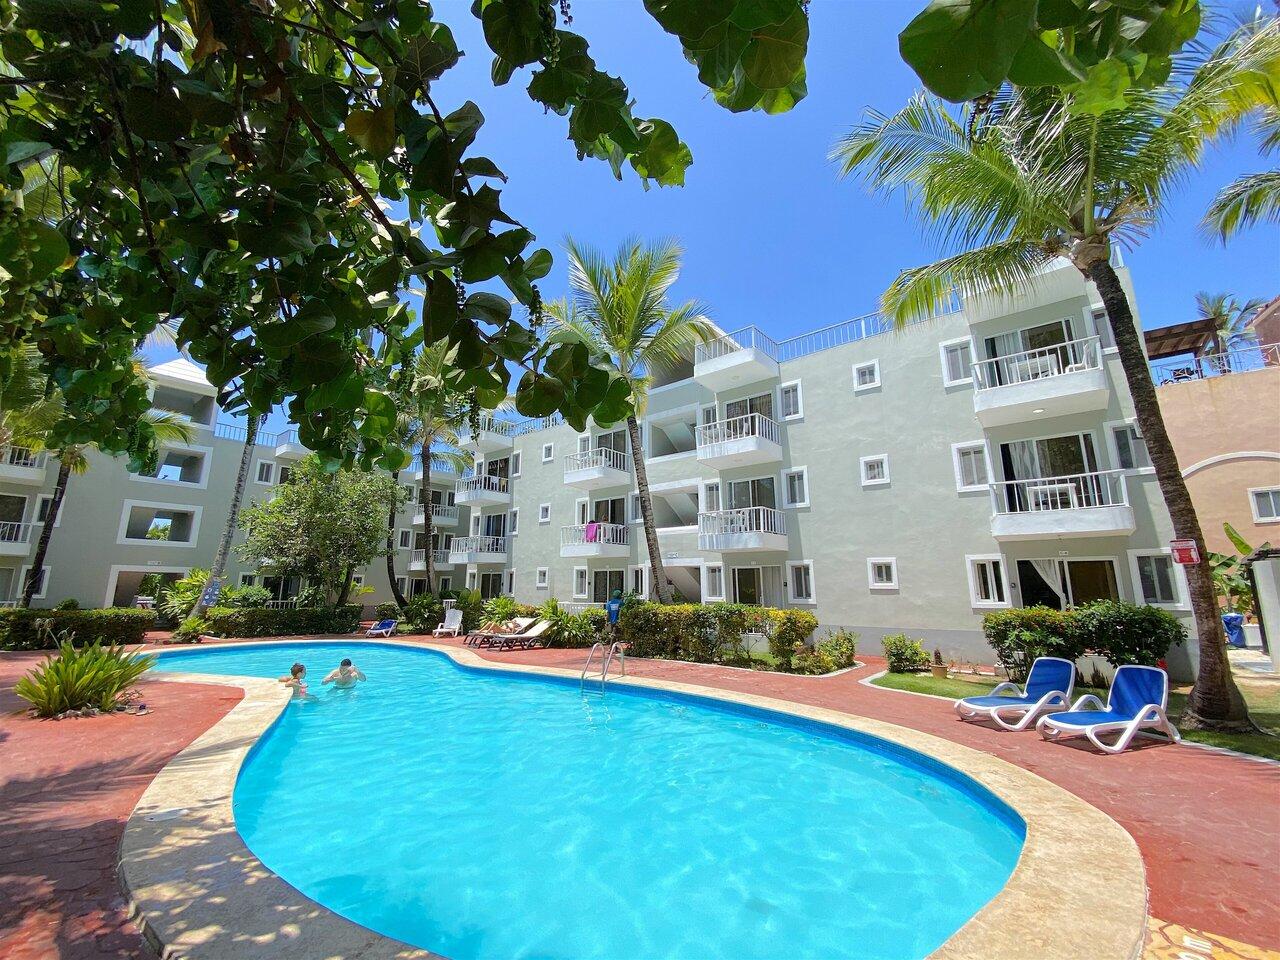 Coral Suites Beach Club & Spa Playa Los Corales